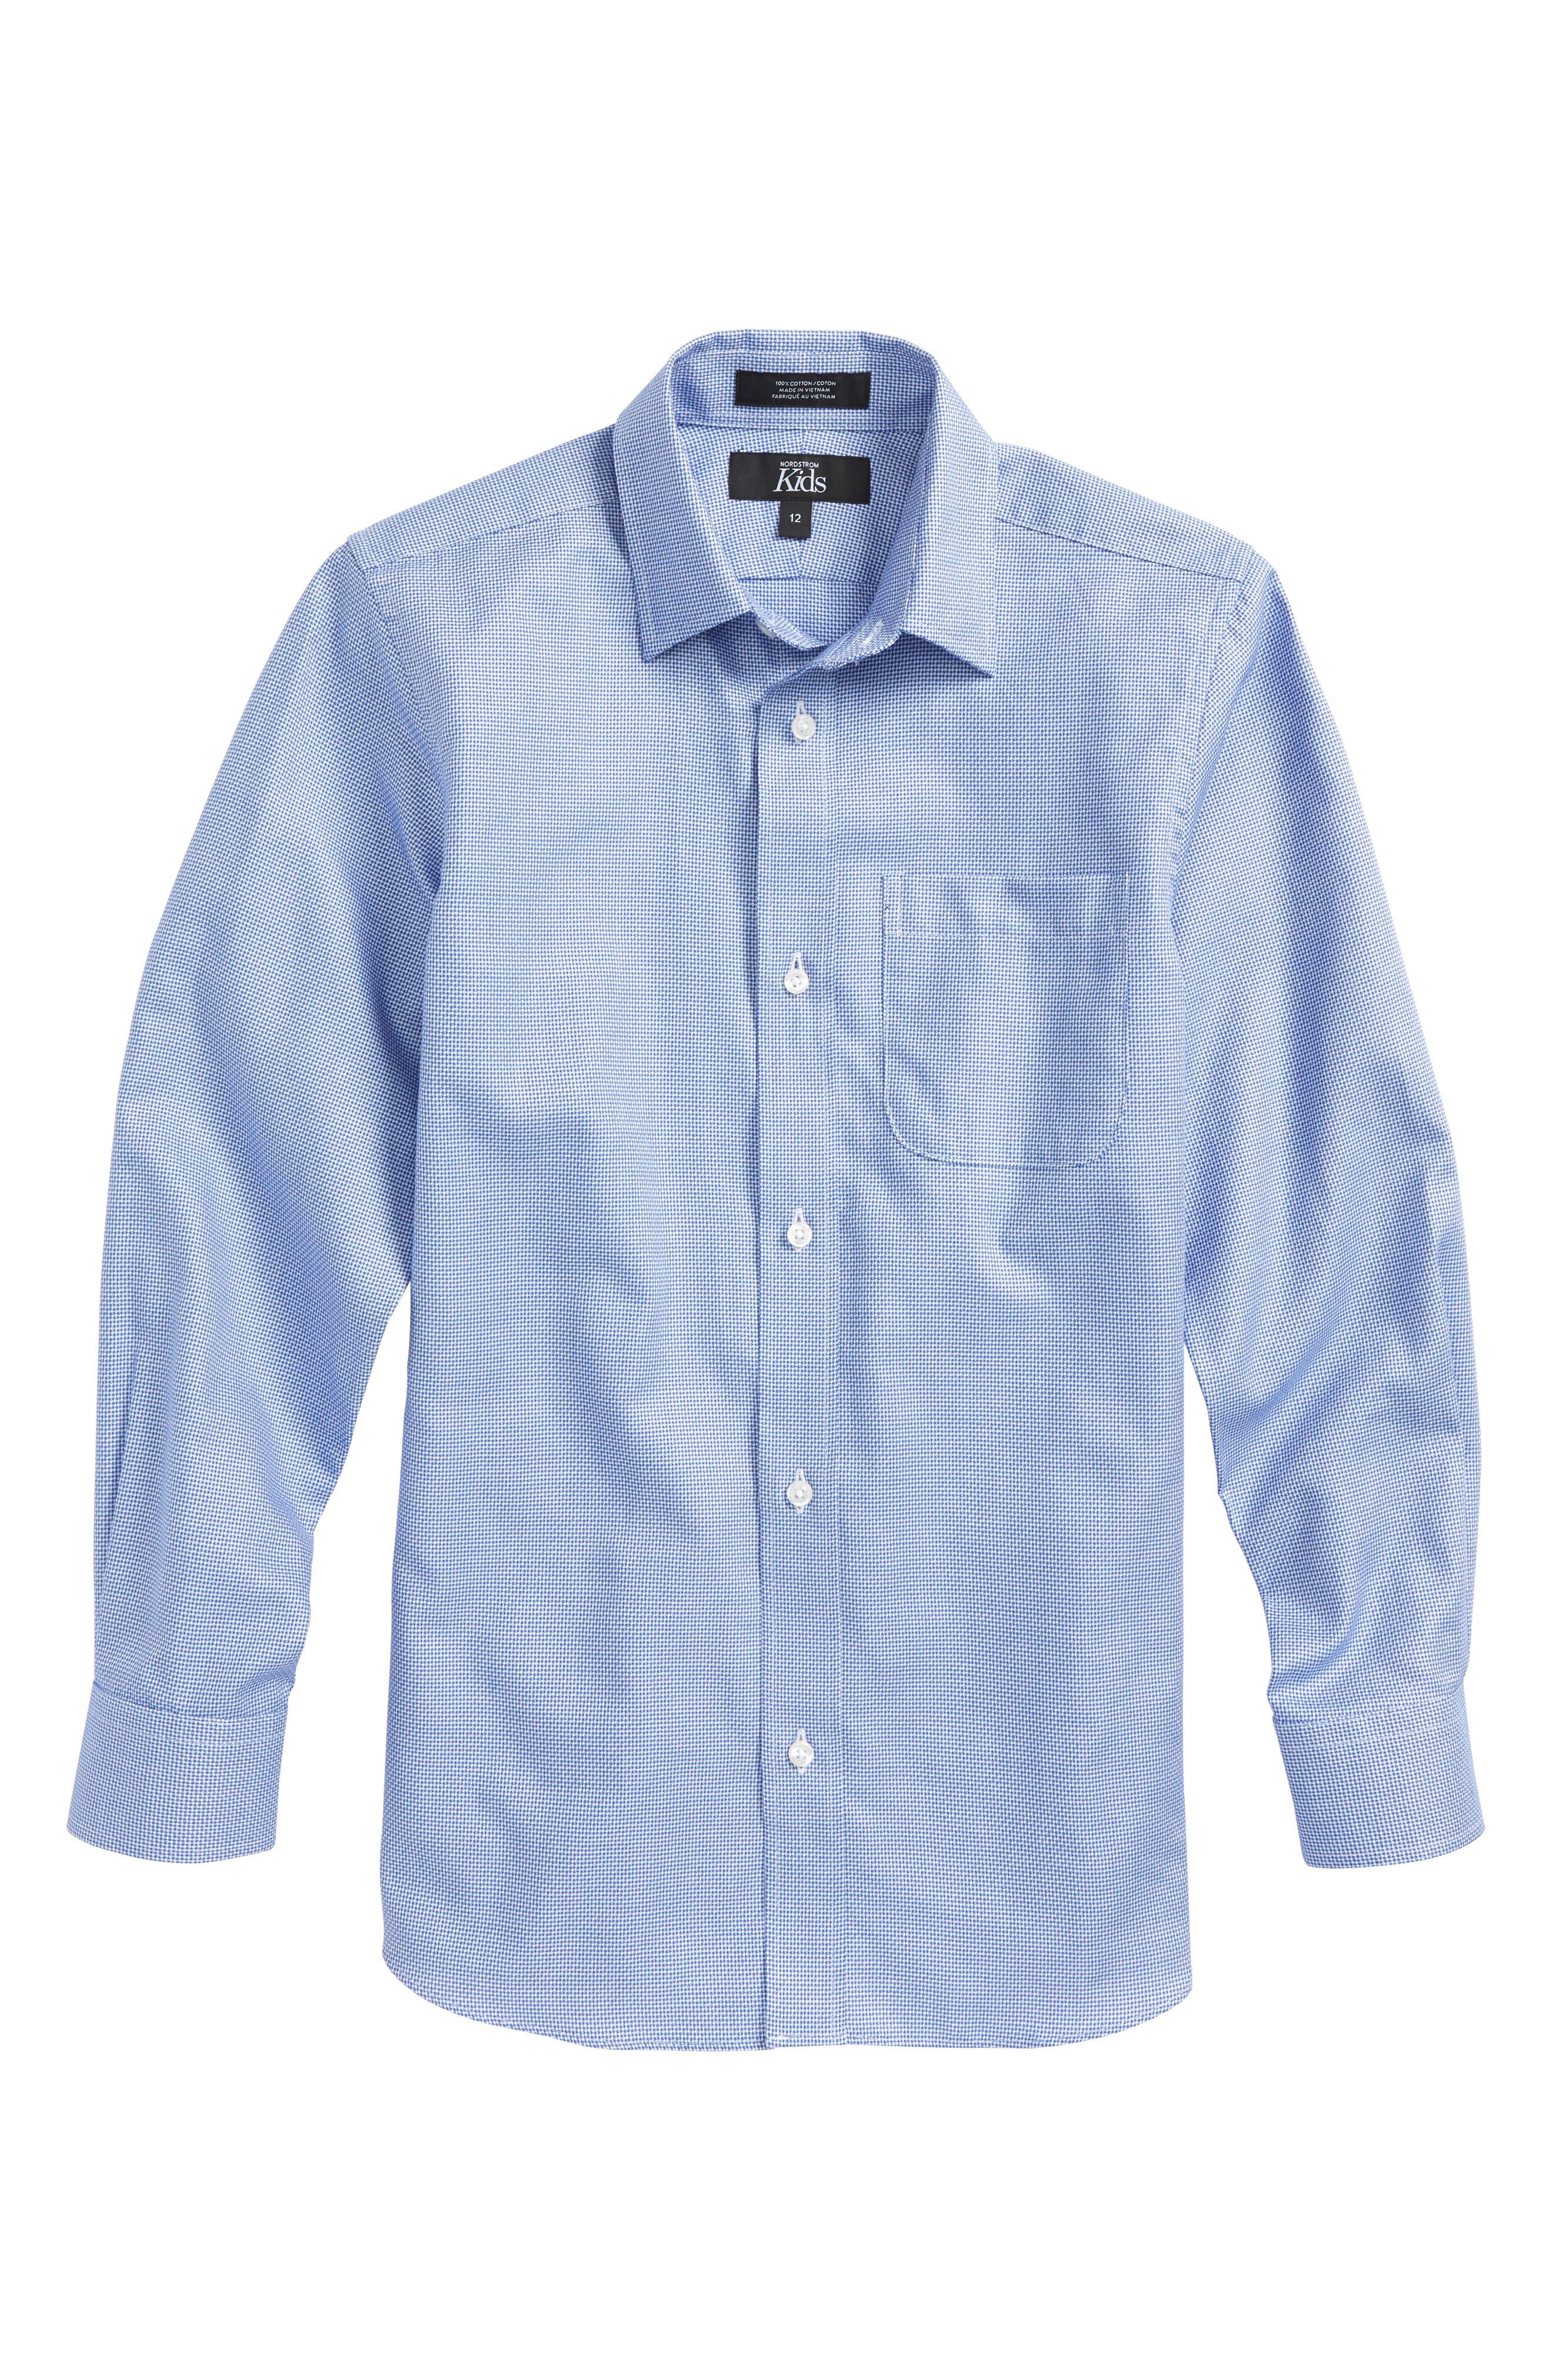 Sodalite Dobby Sport Shirt,                             Main thumbnail 1, color,                             Blue Sodalite Dobby